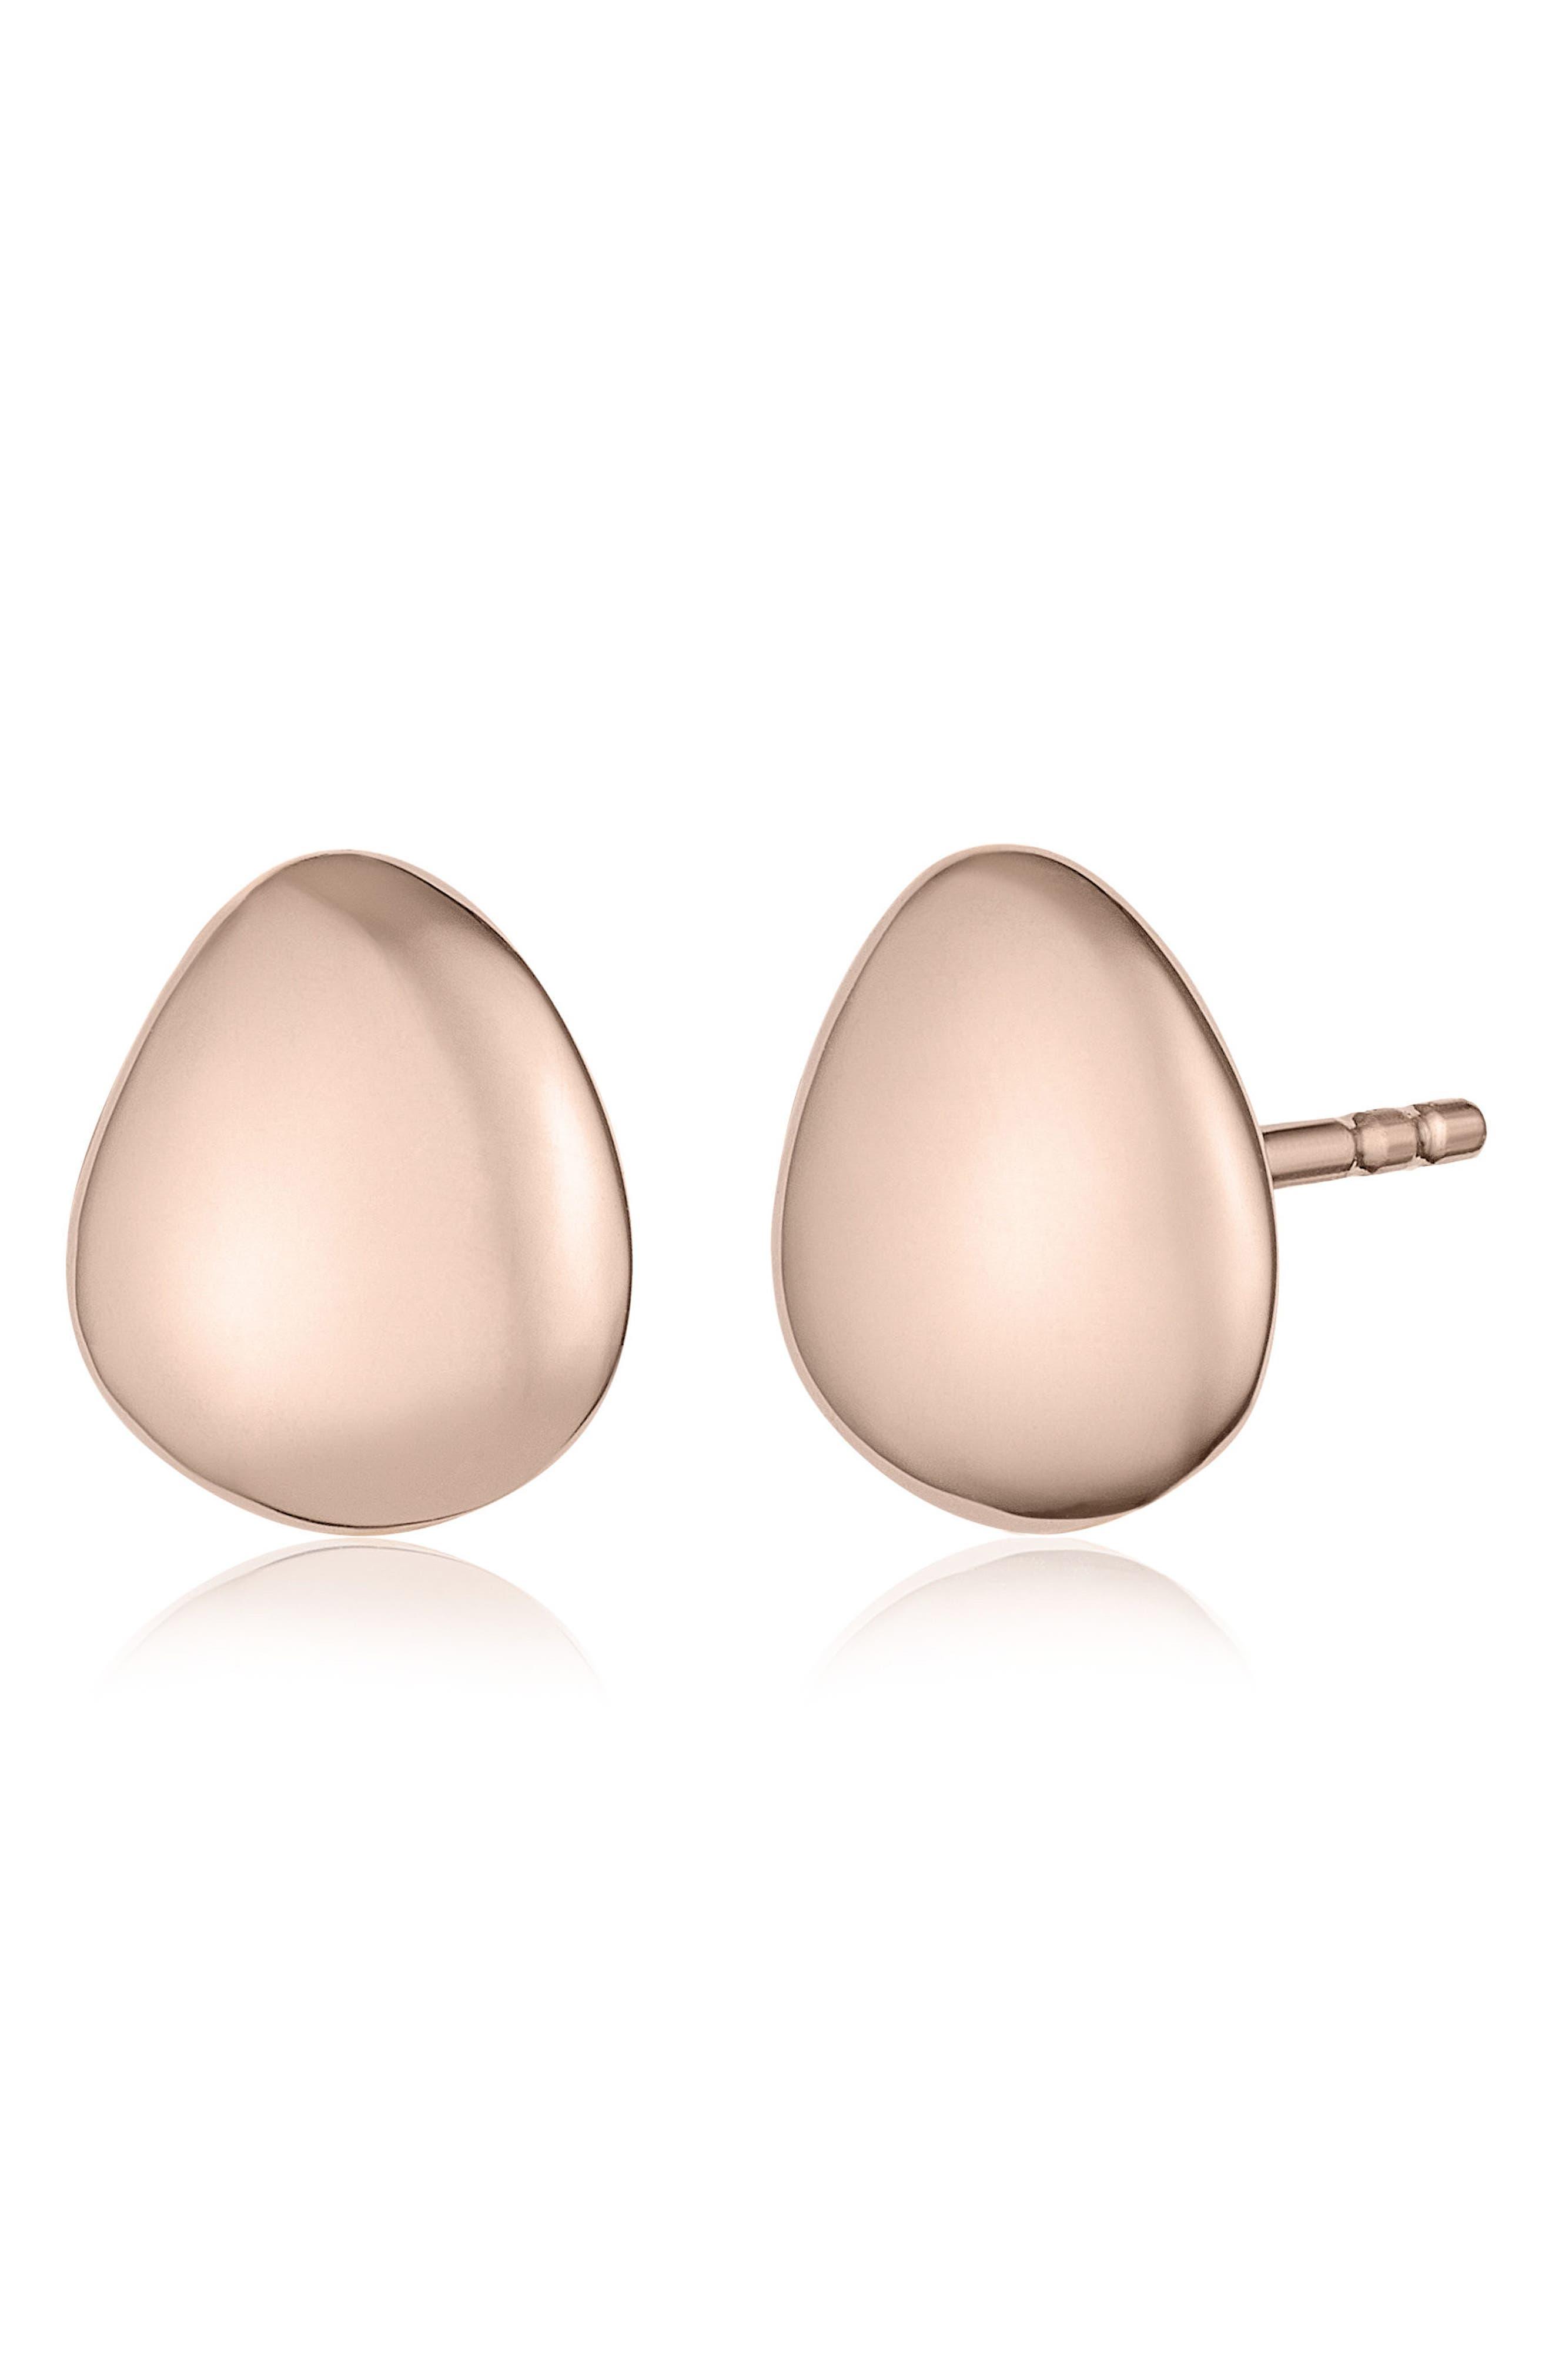 Nura Small Pebble Stud Earrings,                         Main,                         color, ROSE GOLD